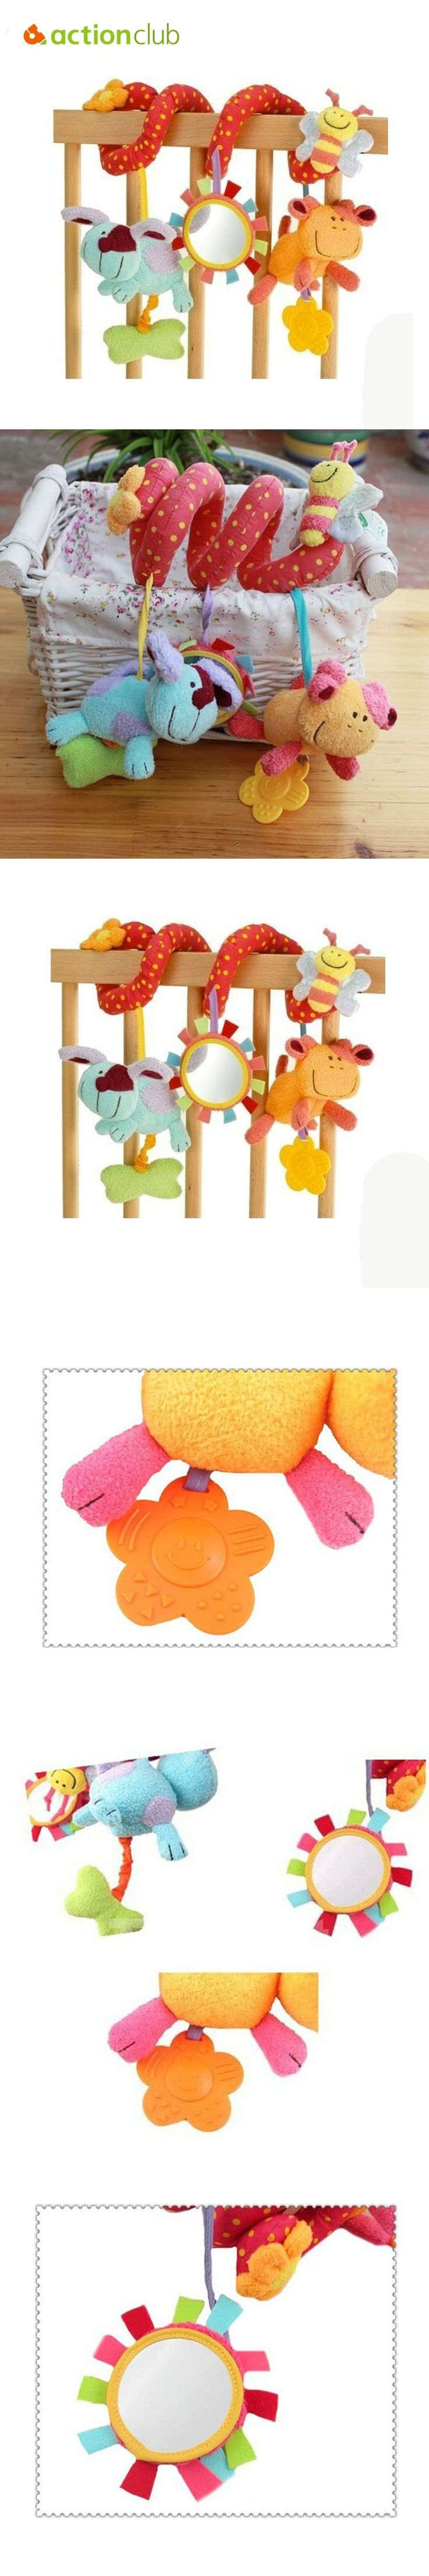 1pcs/lot ELC Baby Toy,Multifunctional Animals Around/Lathe Bed Hang.Safety Mirrors/BB Device/Teeth Glue/Take Pull ShockHT82600MU